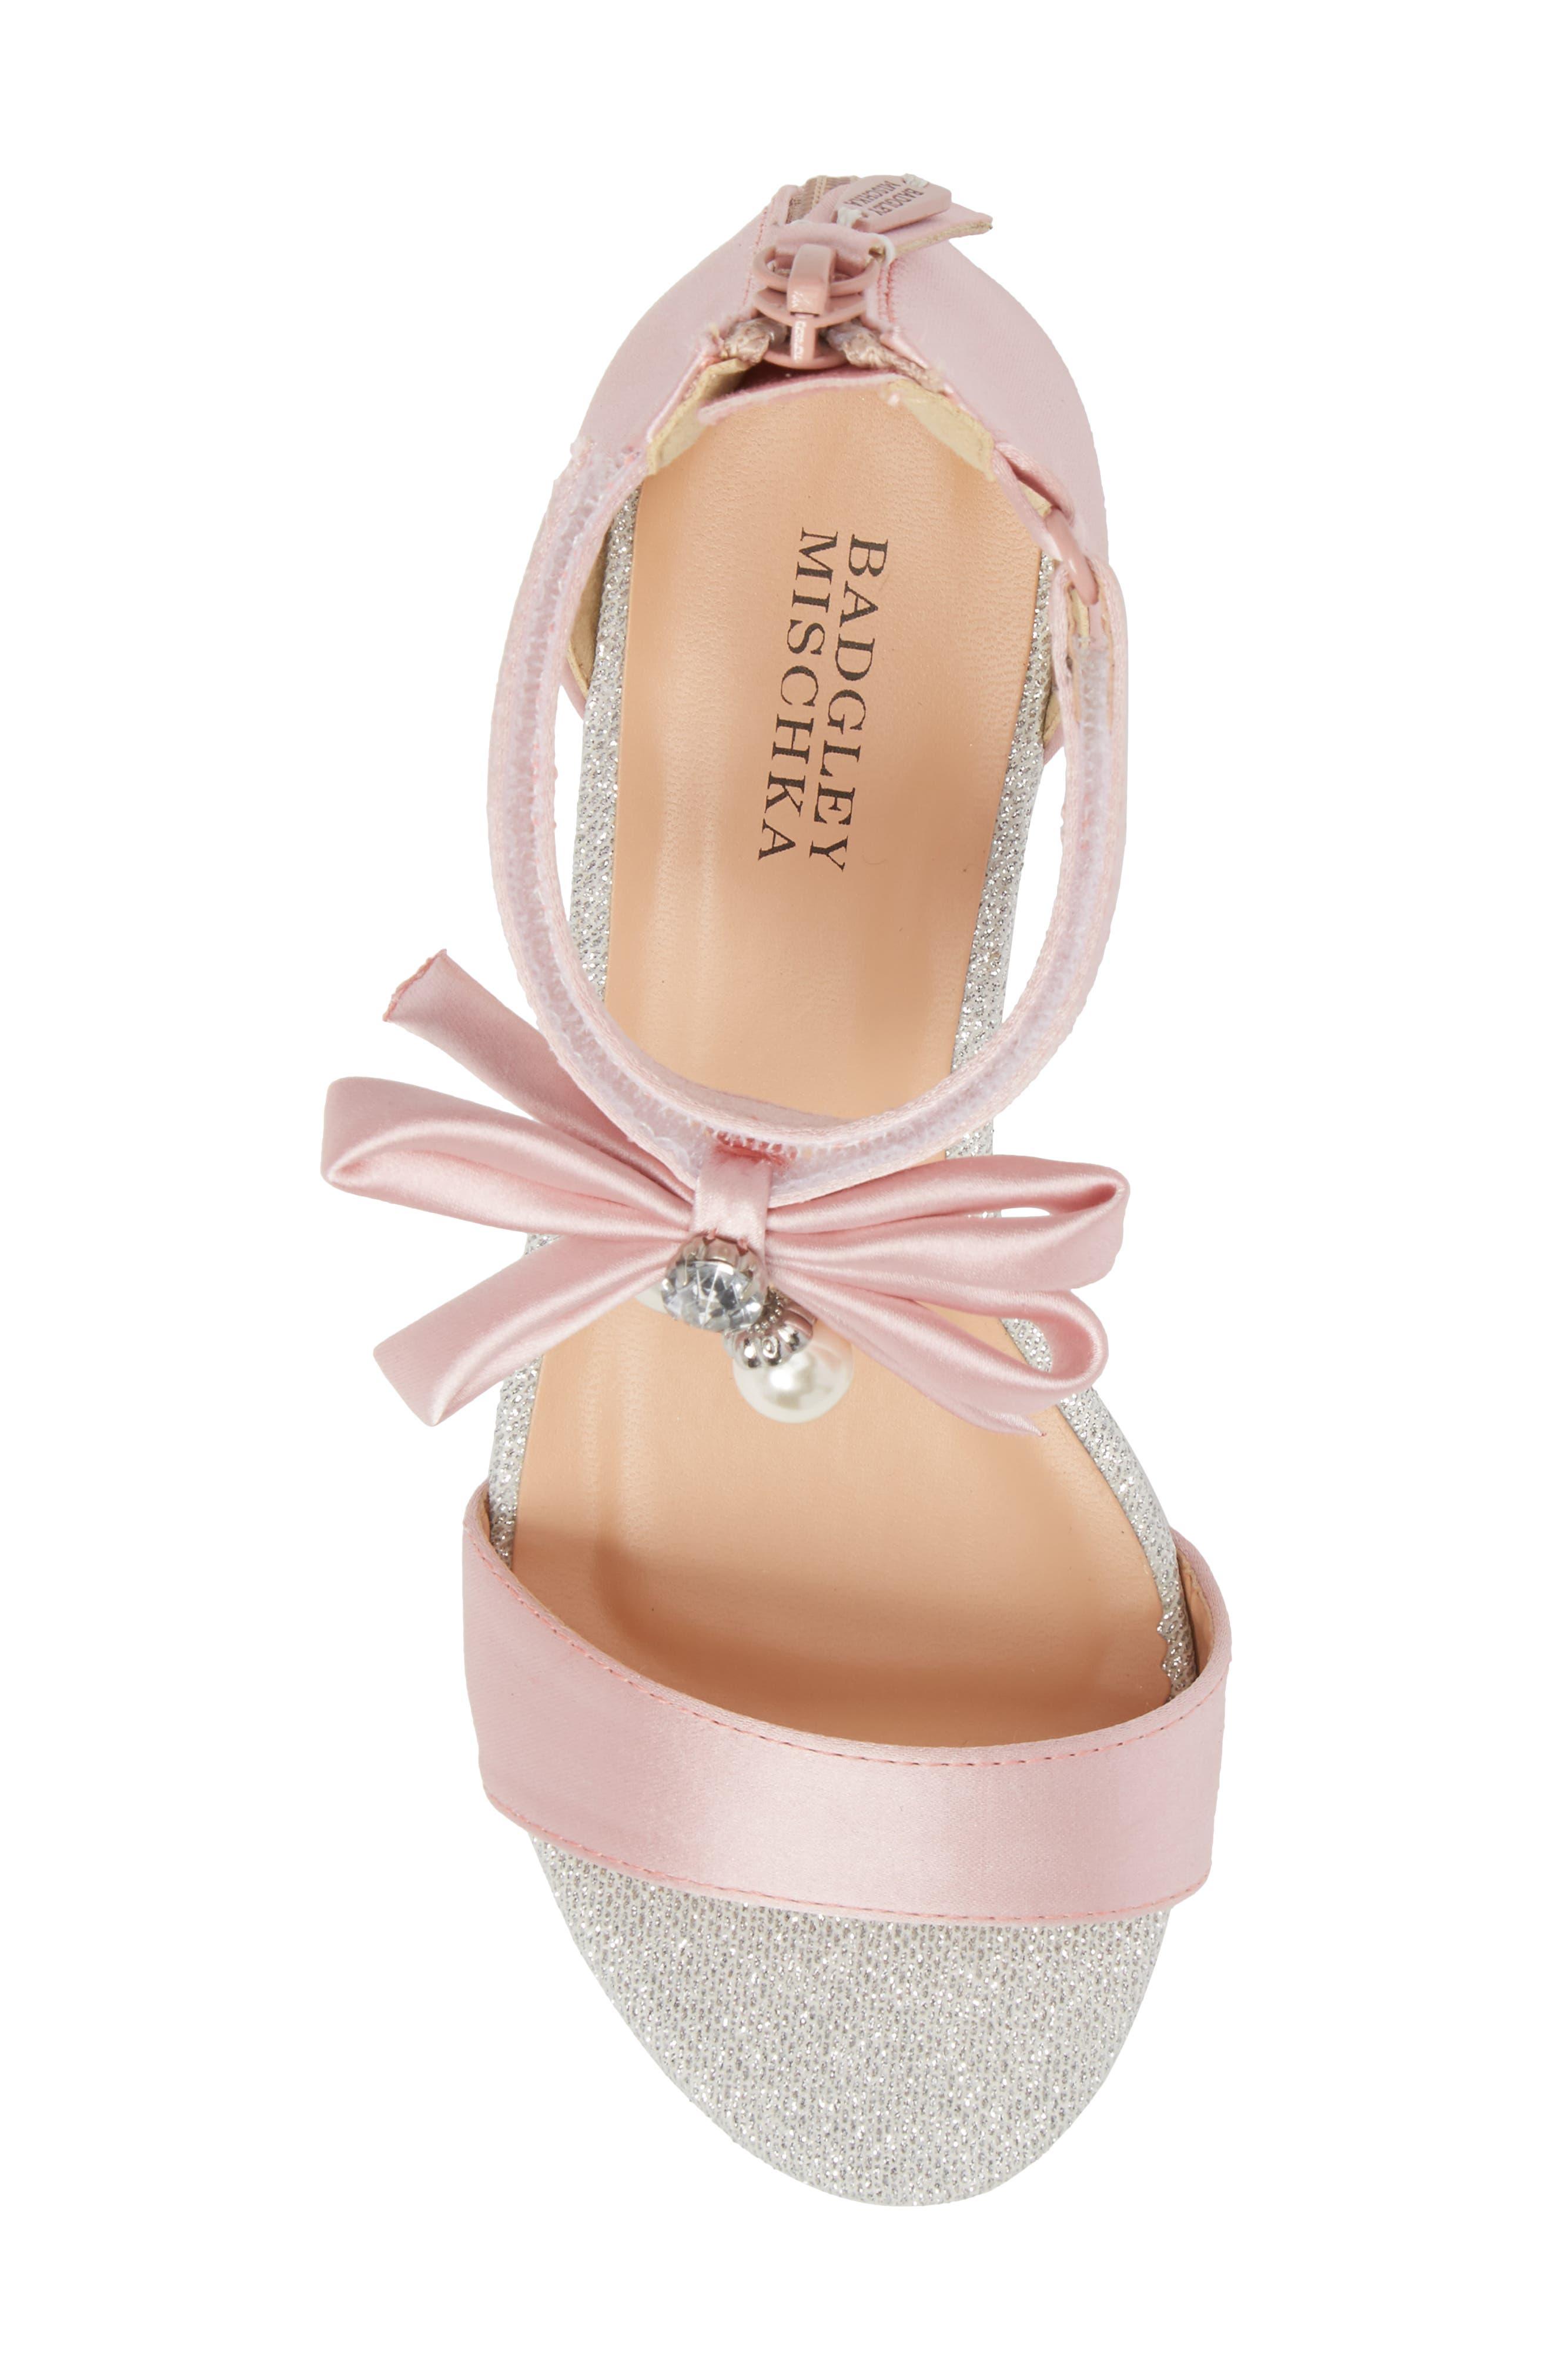 Pernia Embellished Sandal,                             Alternate thumbnail 5, color,                             PINK/ SILVER